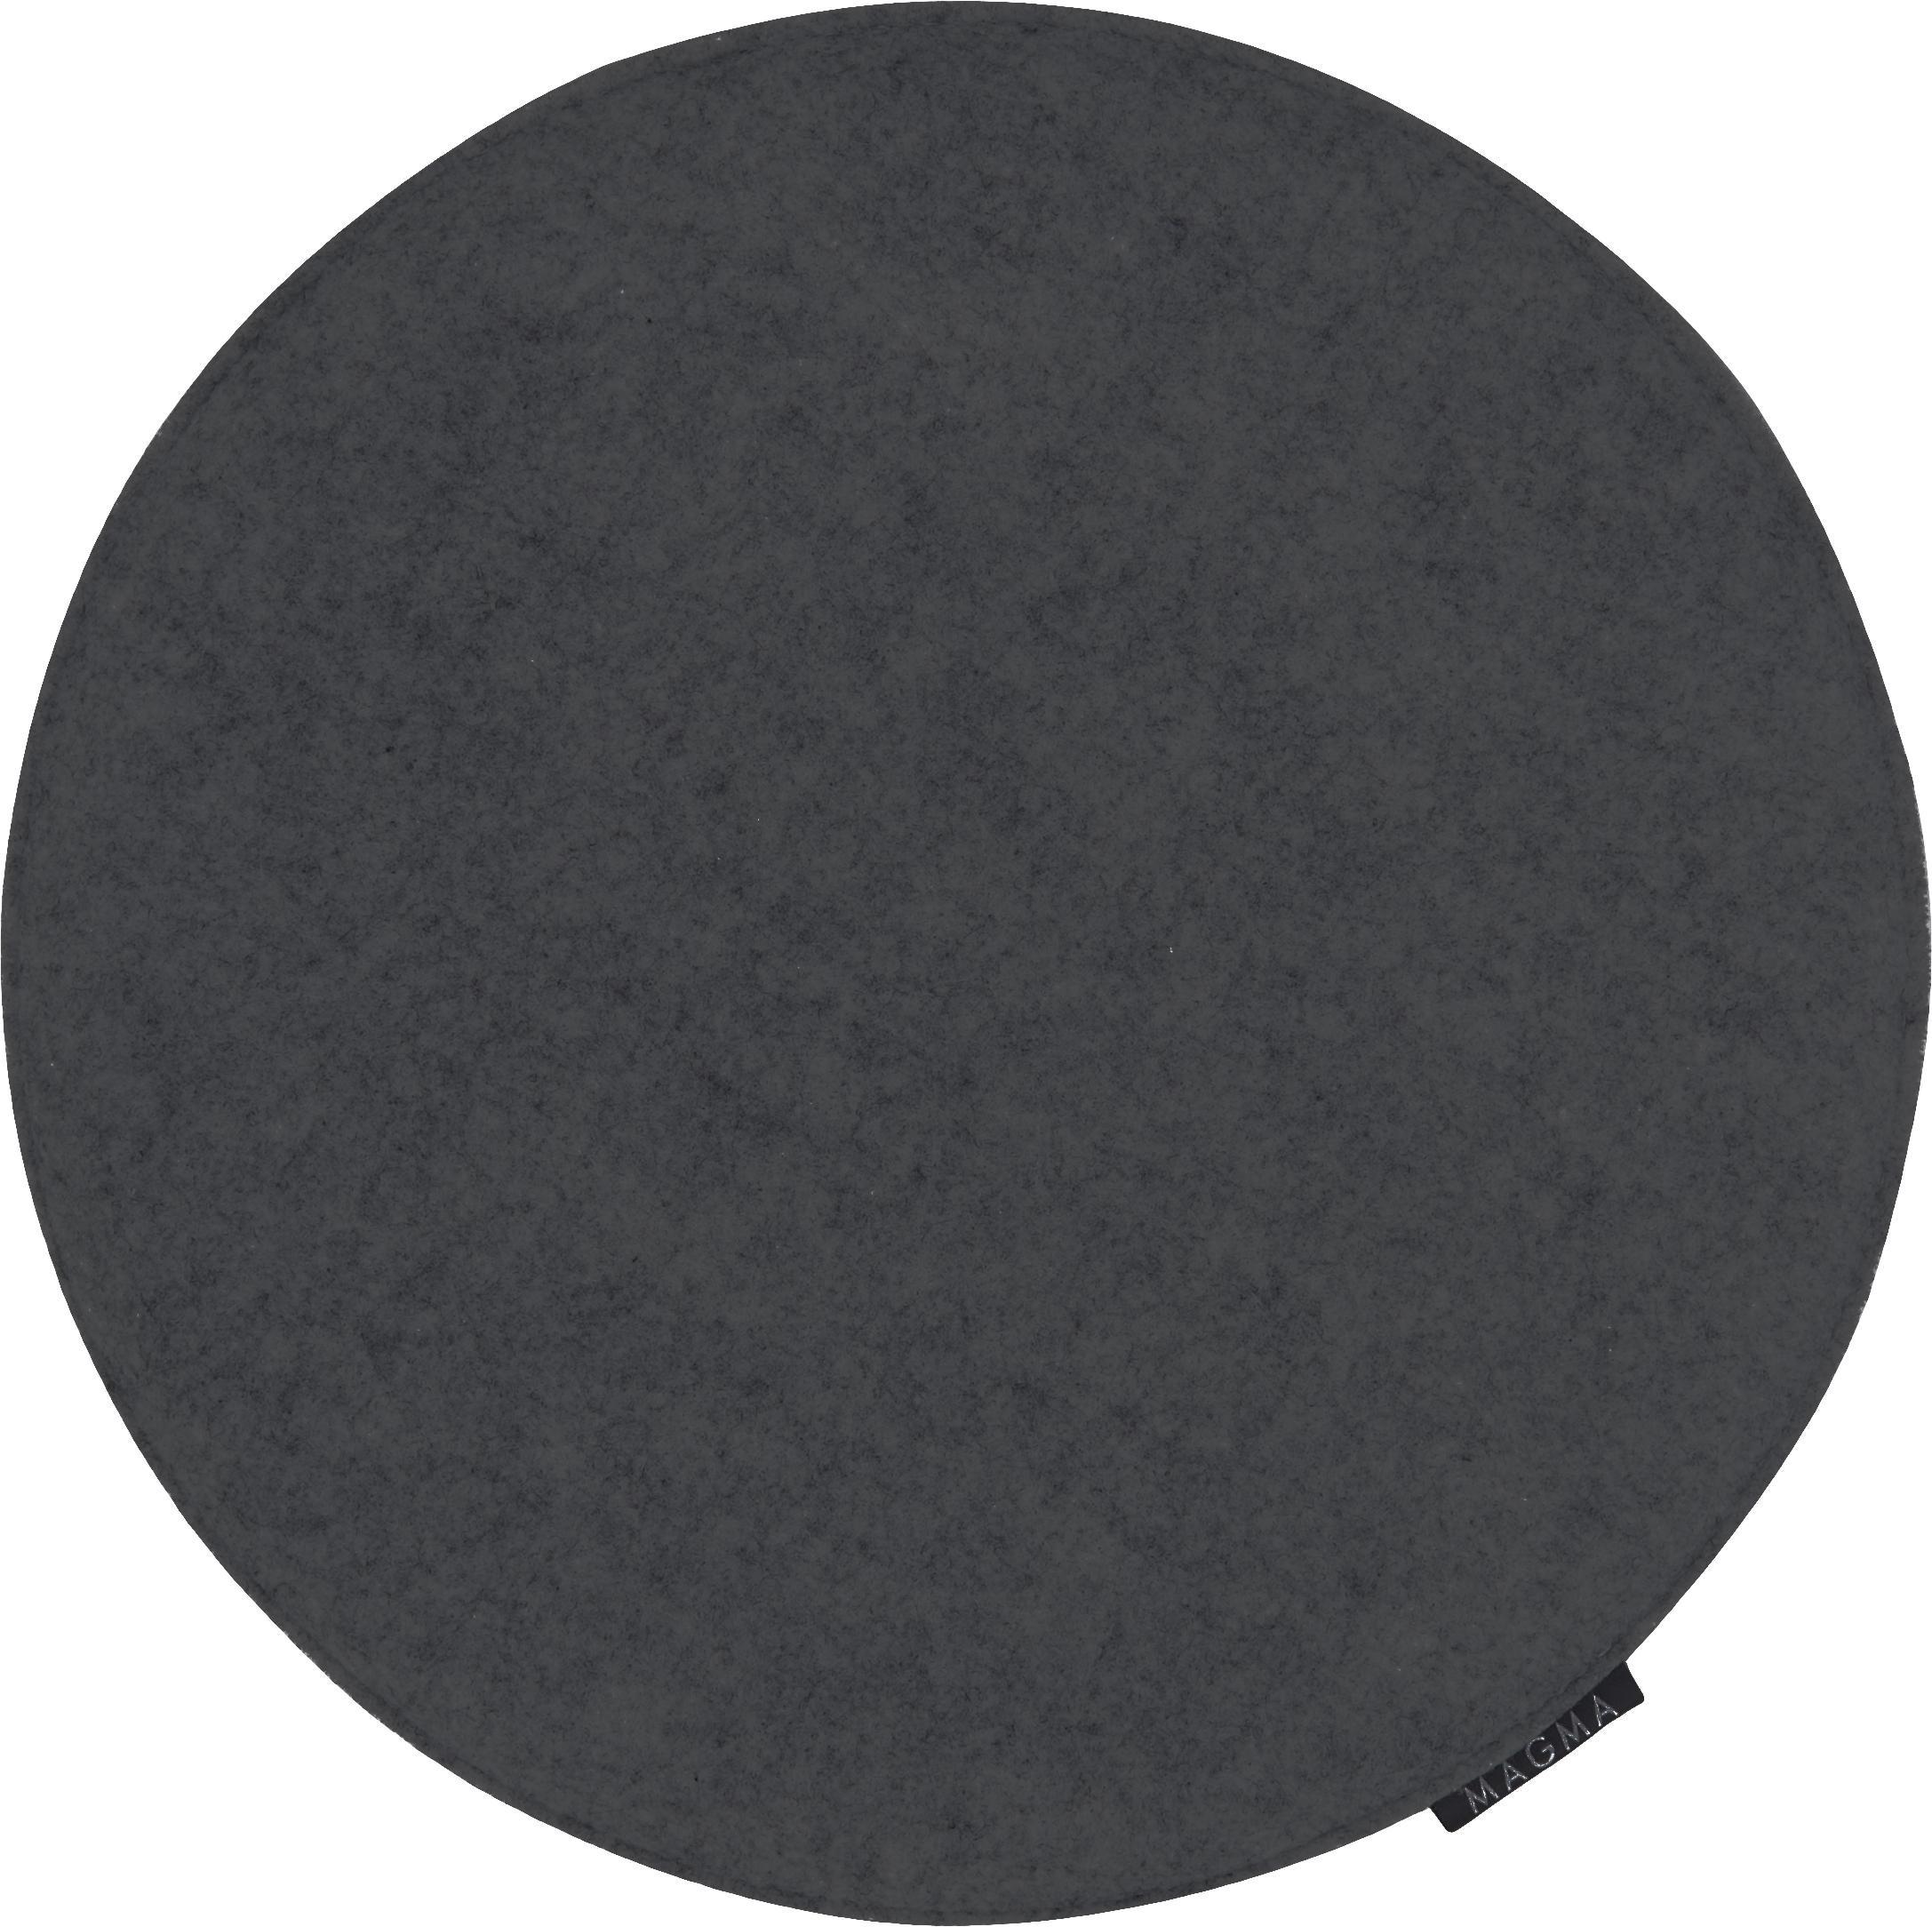 Ronde vilten stoelkussens Avaro, 4 stuks, Antraciet, Ø 35 x H 1 cm